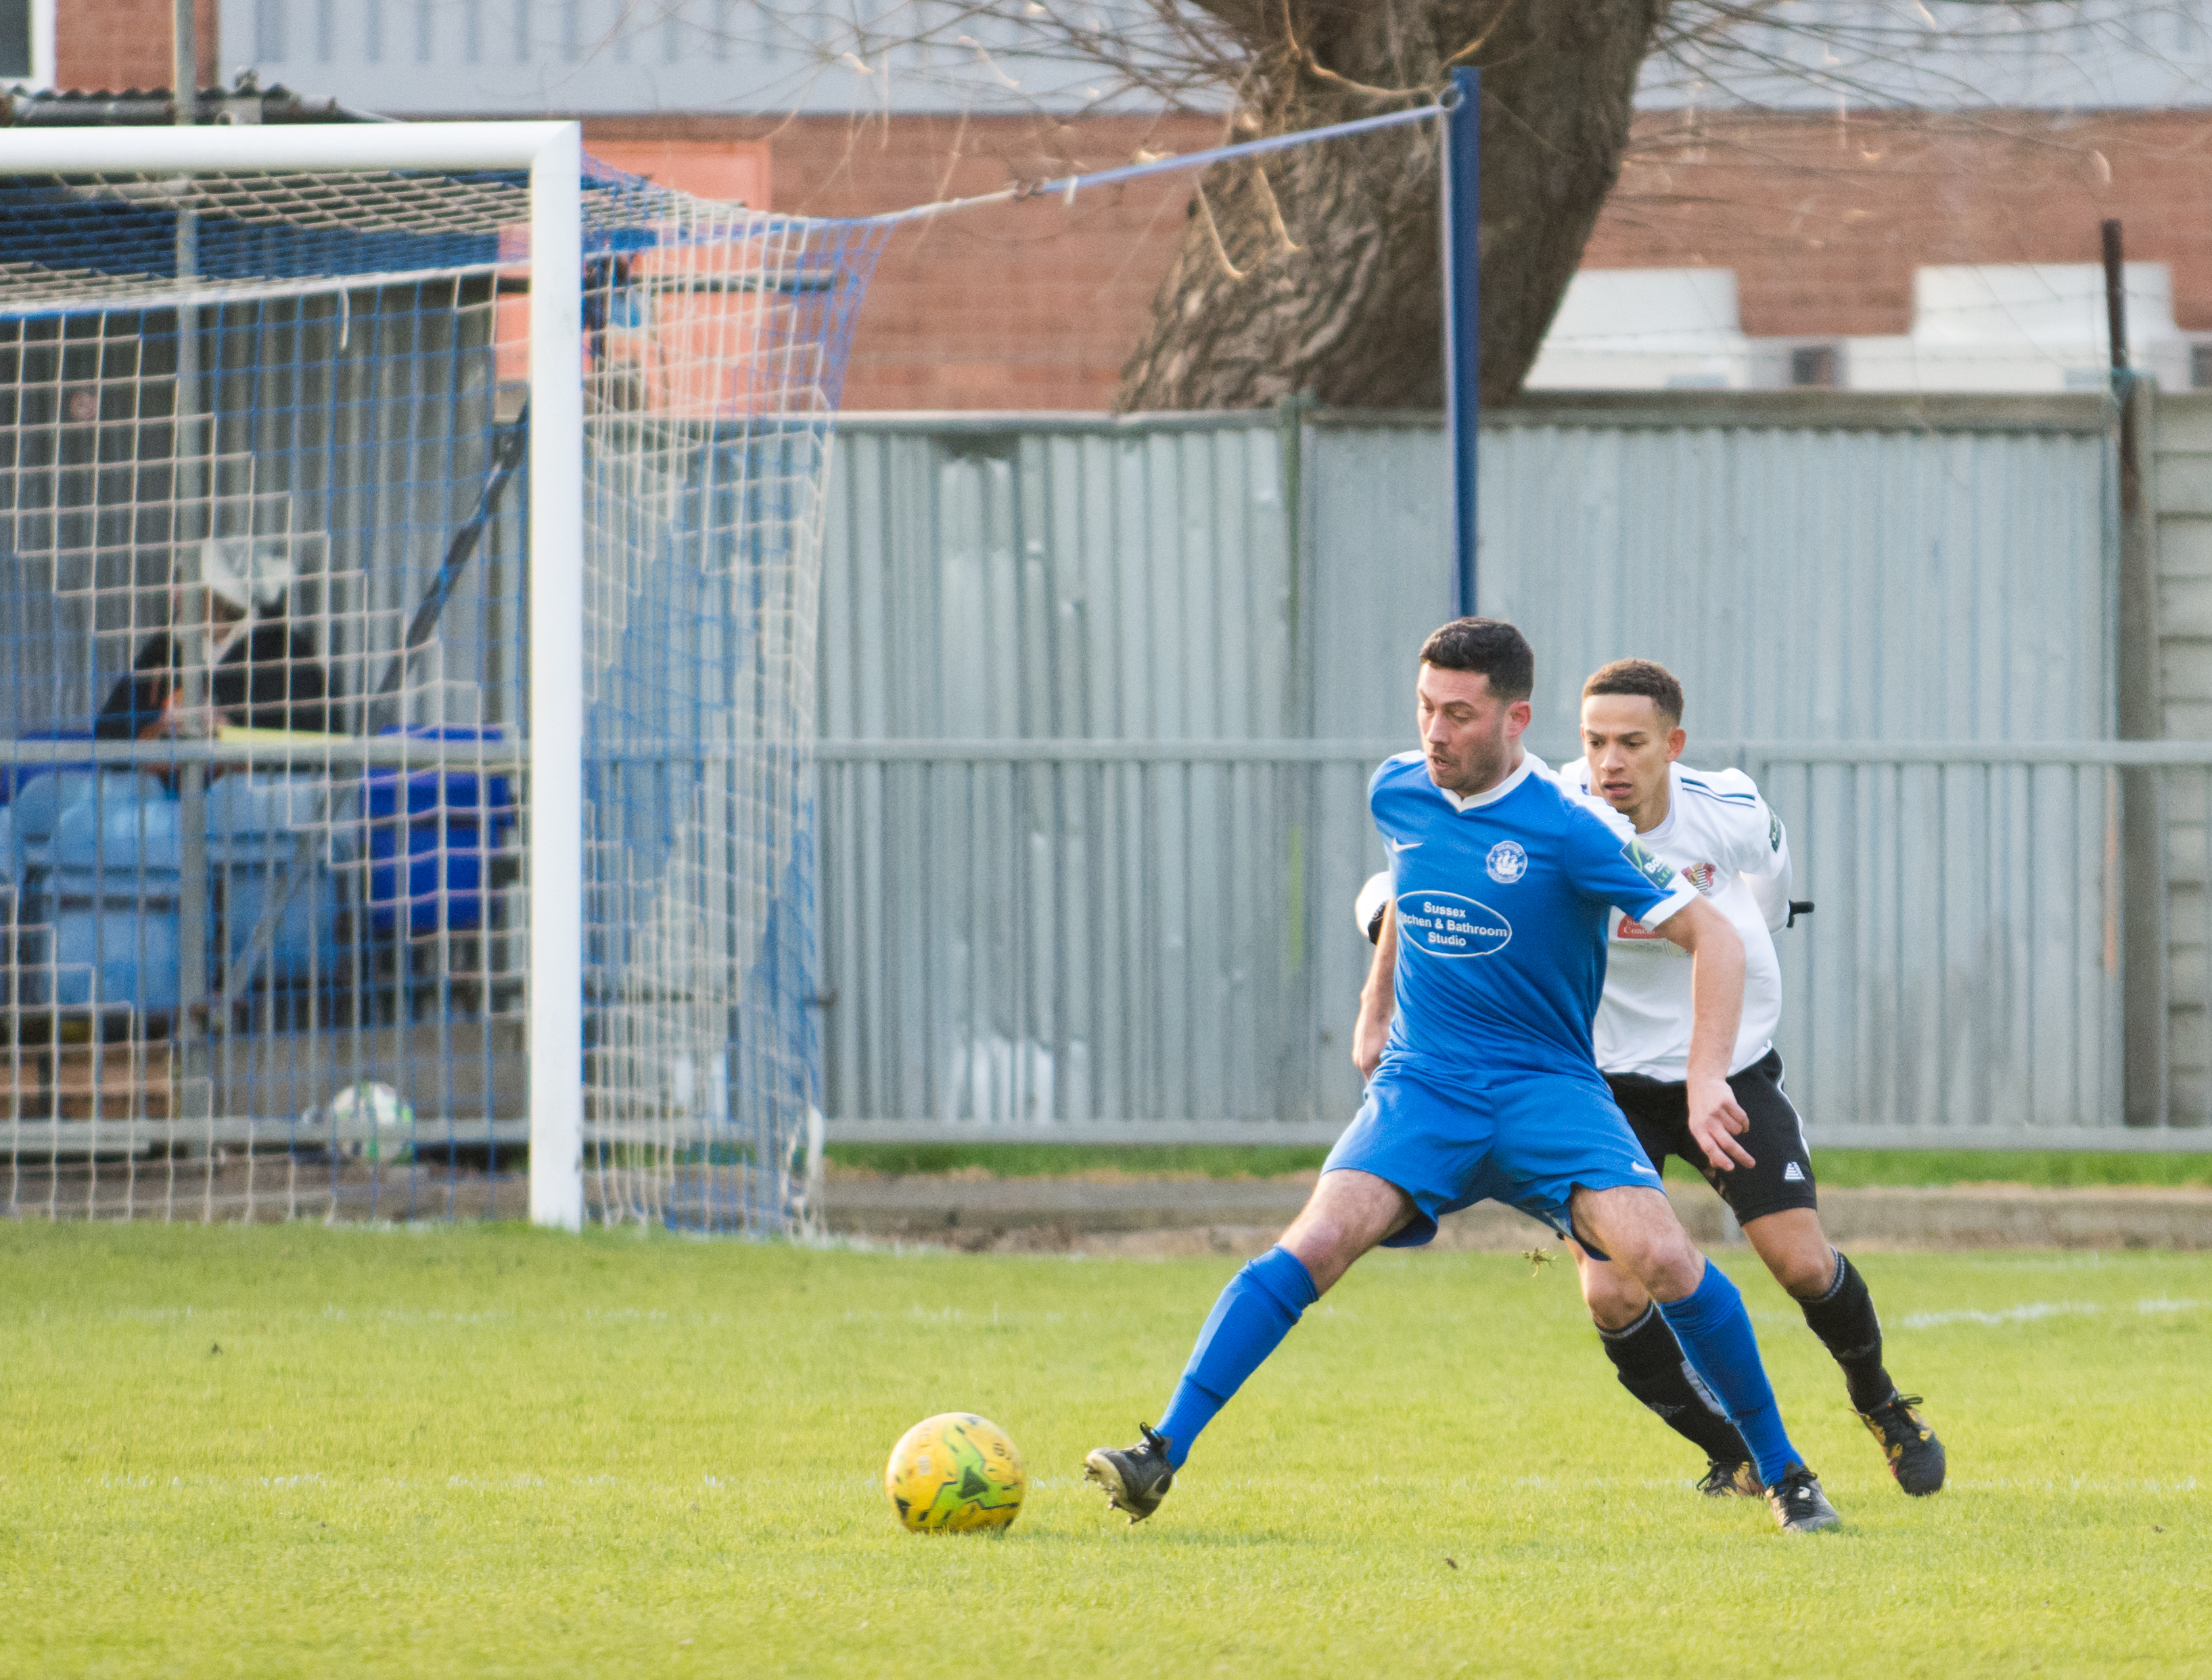 Shoreham FC vs Molesey FC 02.12.17 52